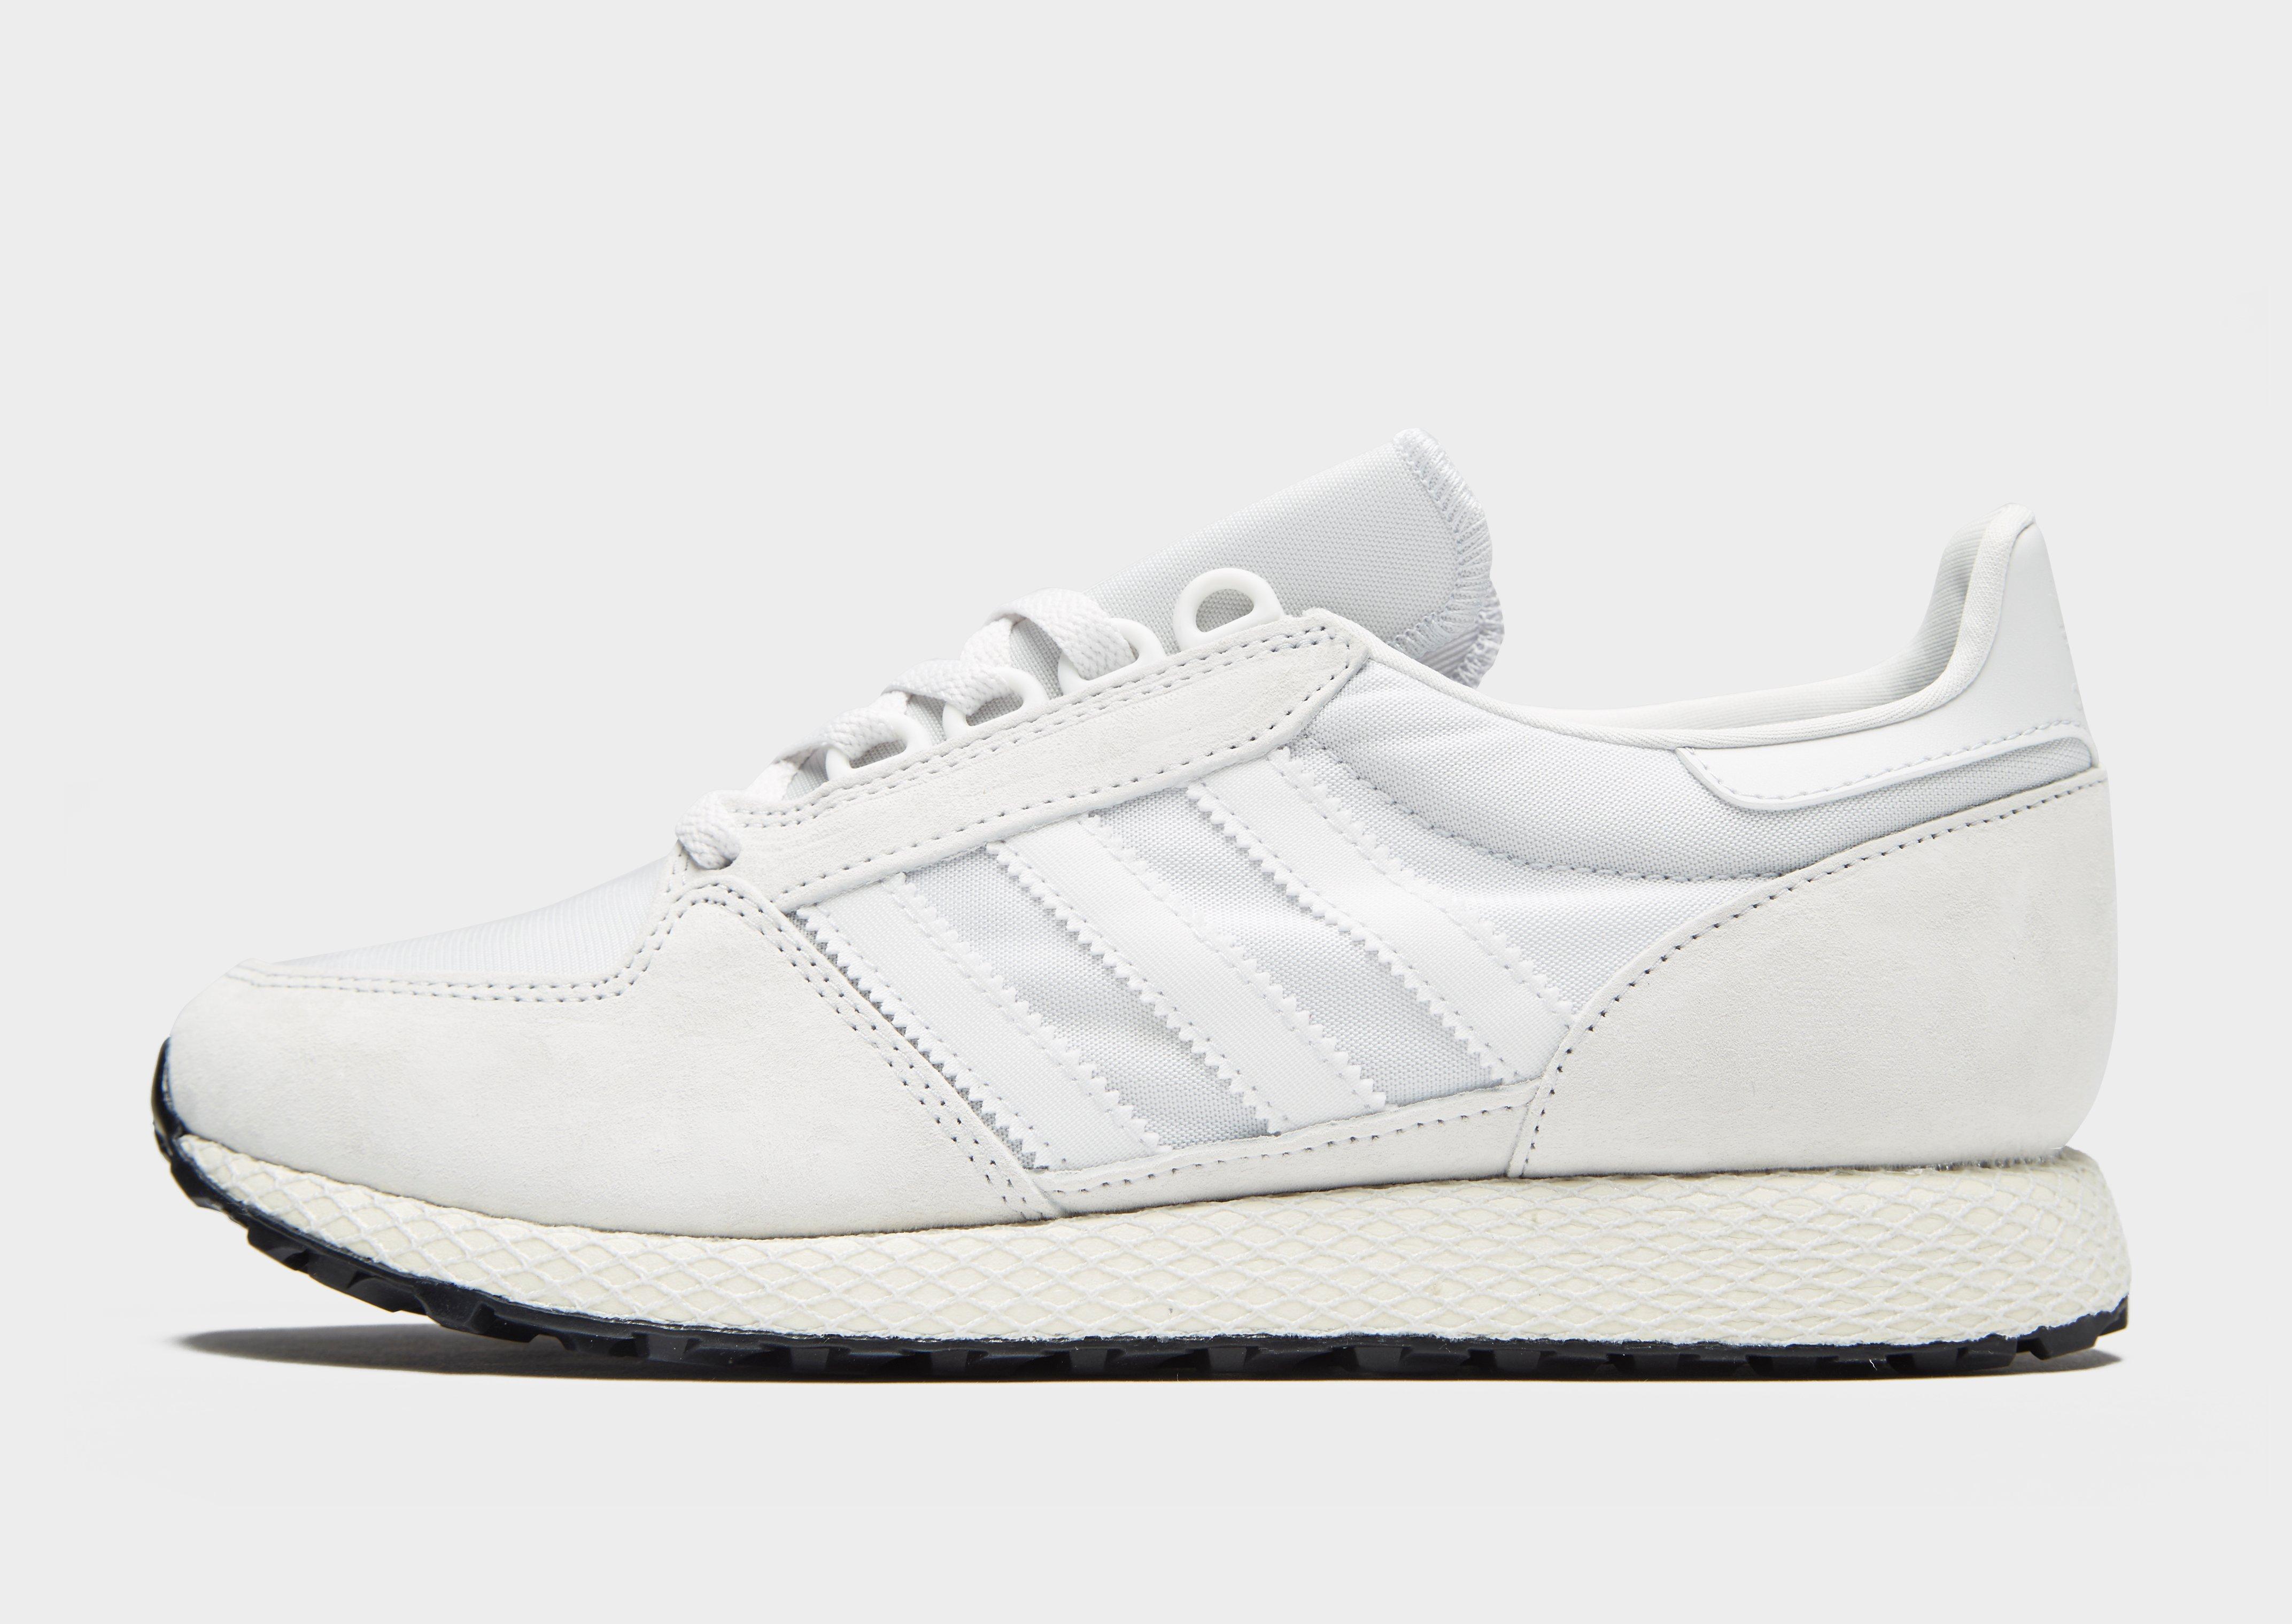 hot sale online d7d14 b3c59 adidas Originals Forest Grove in White for Men - Lyst